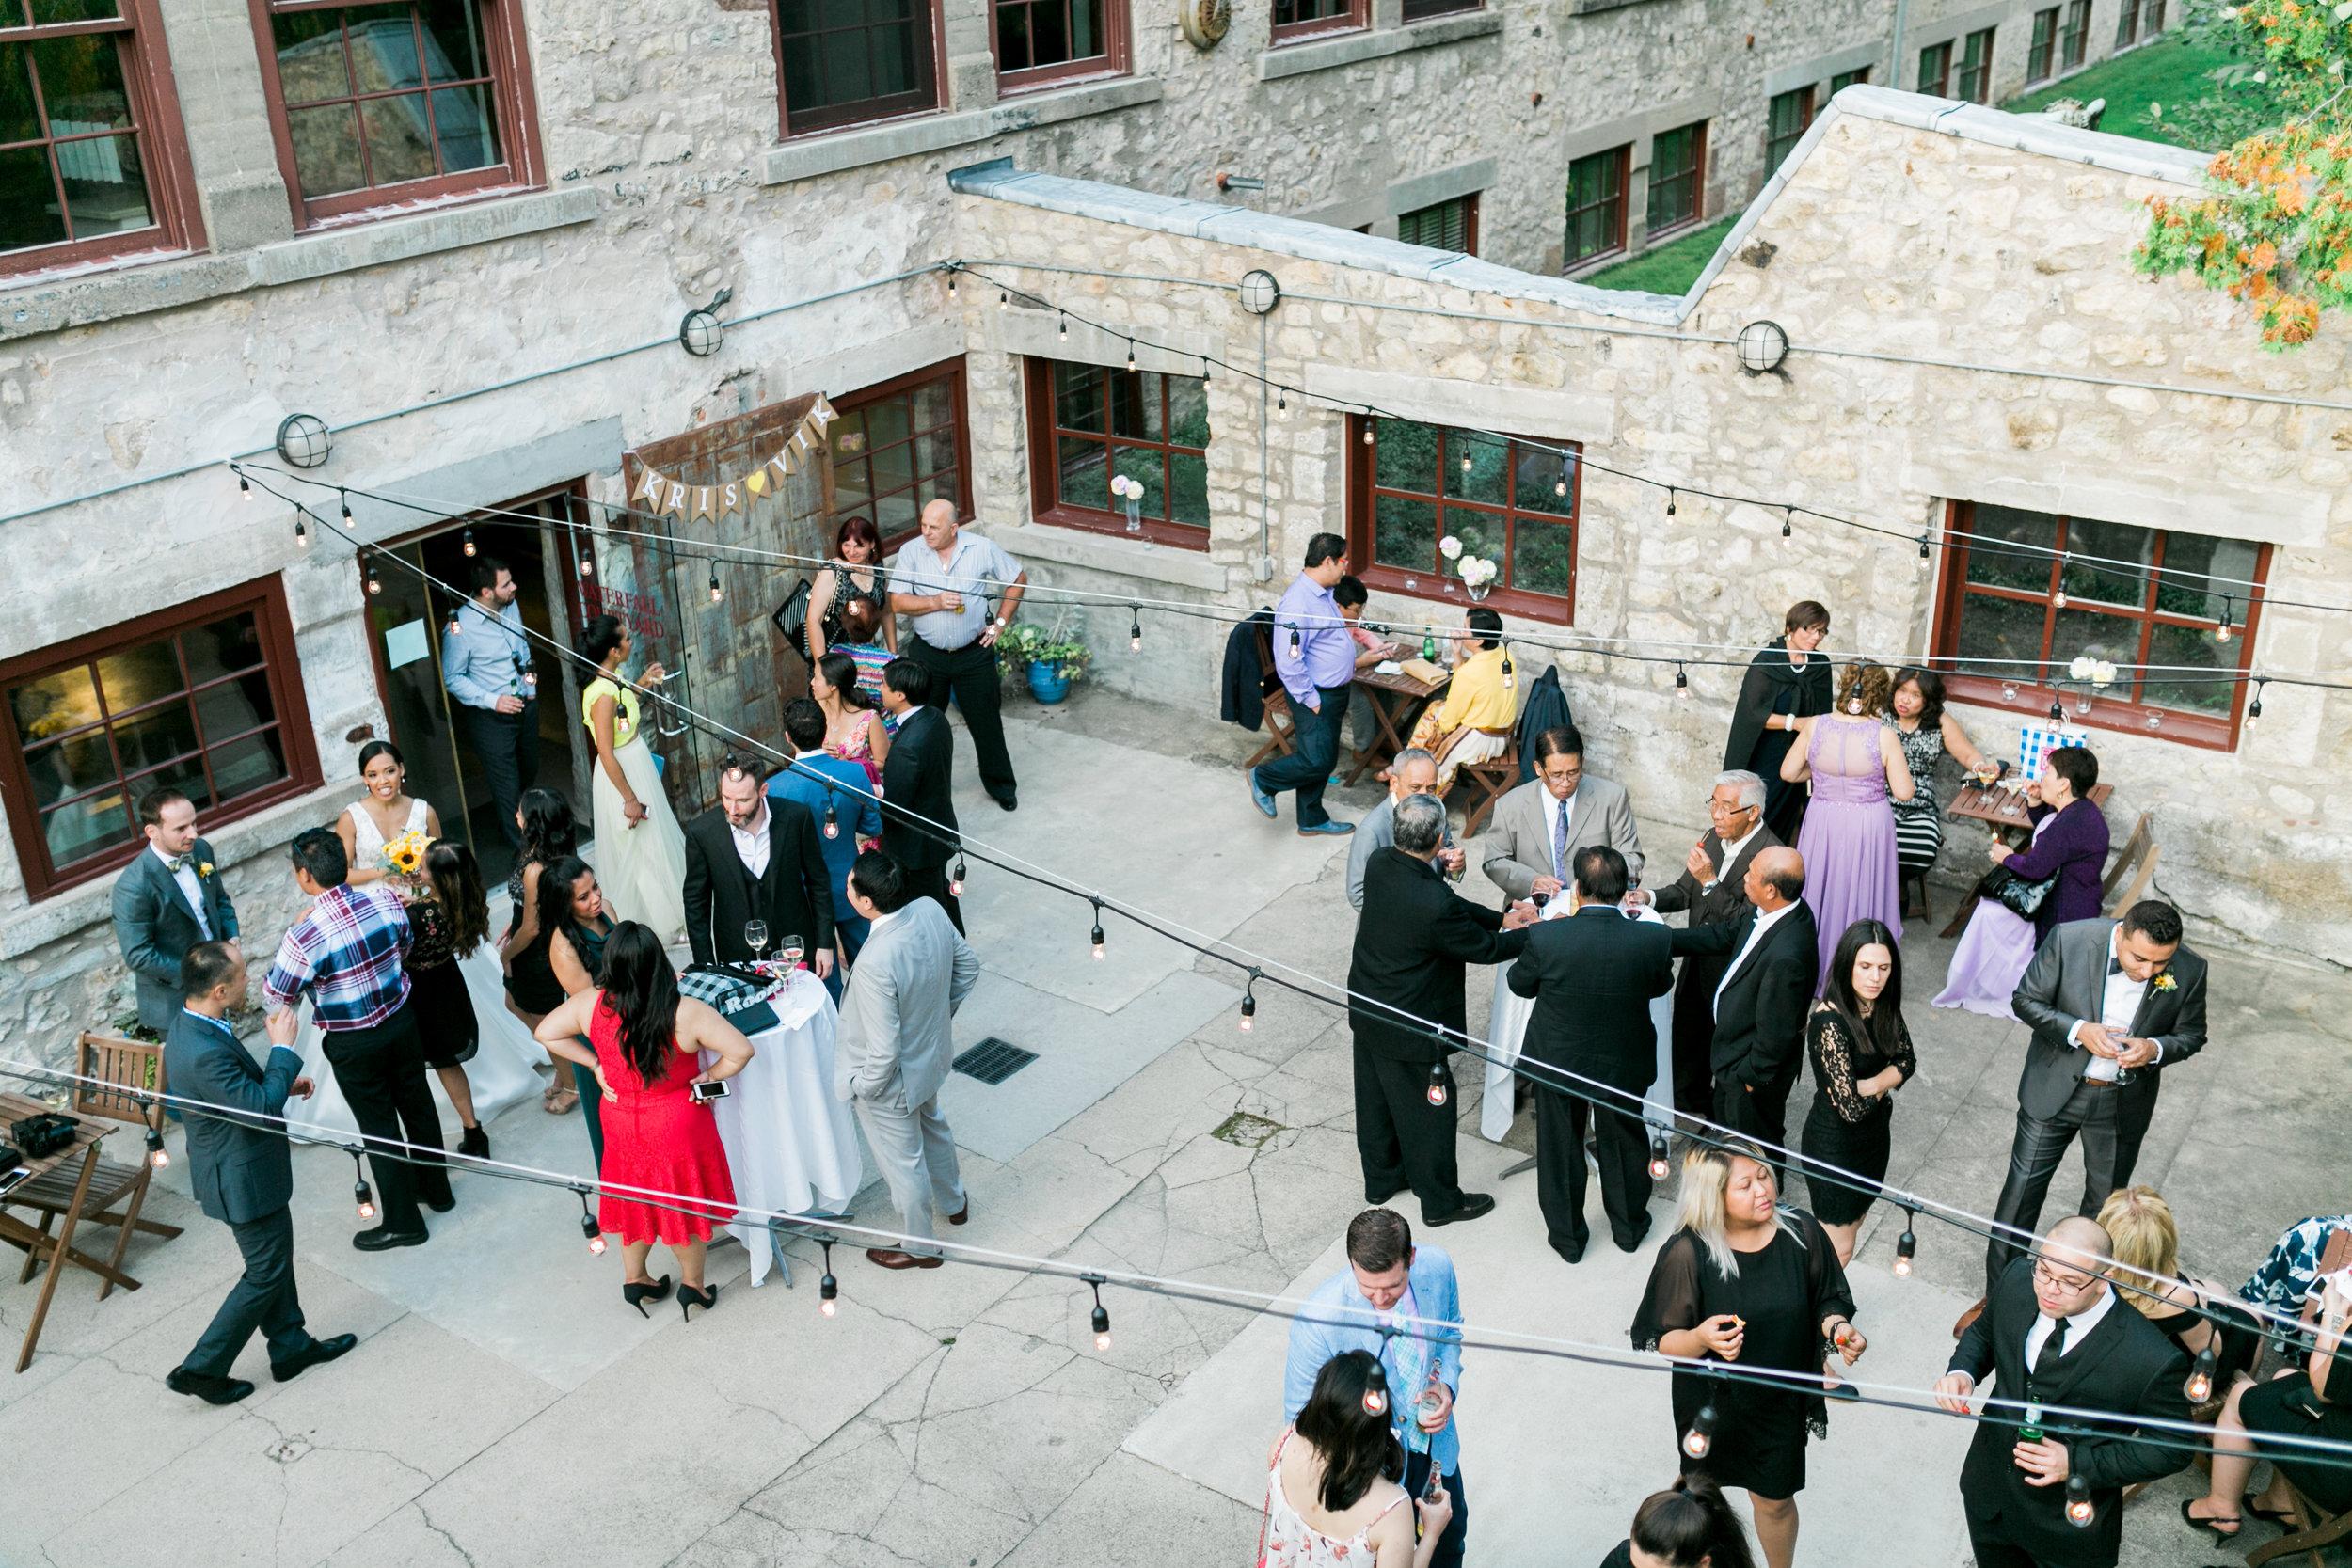 Alton Mills Wedding - Cocktails-29.jpg